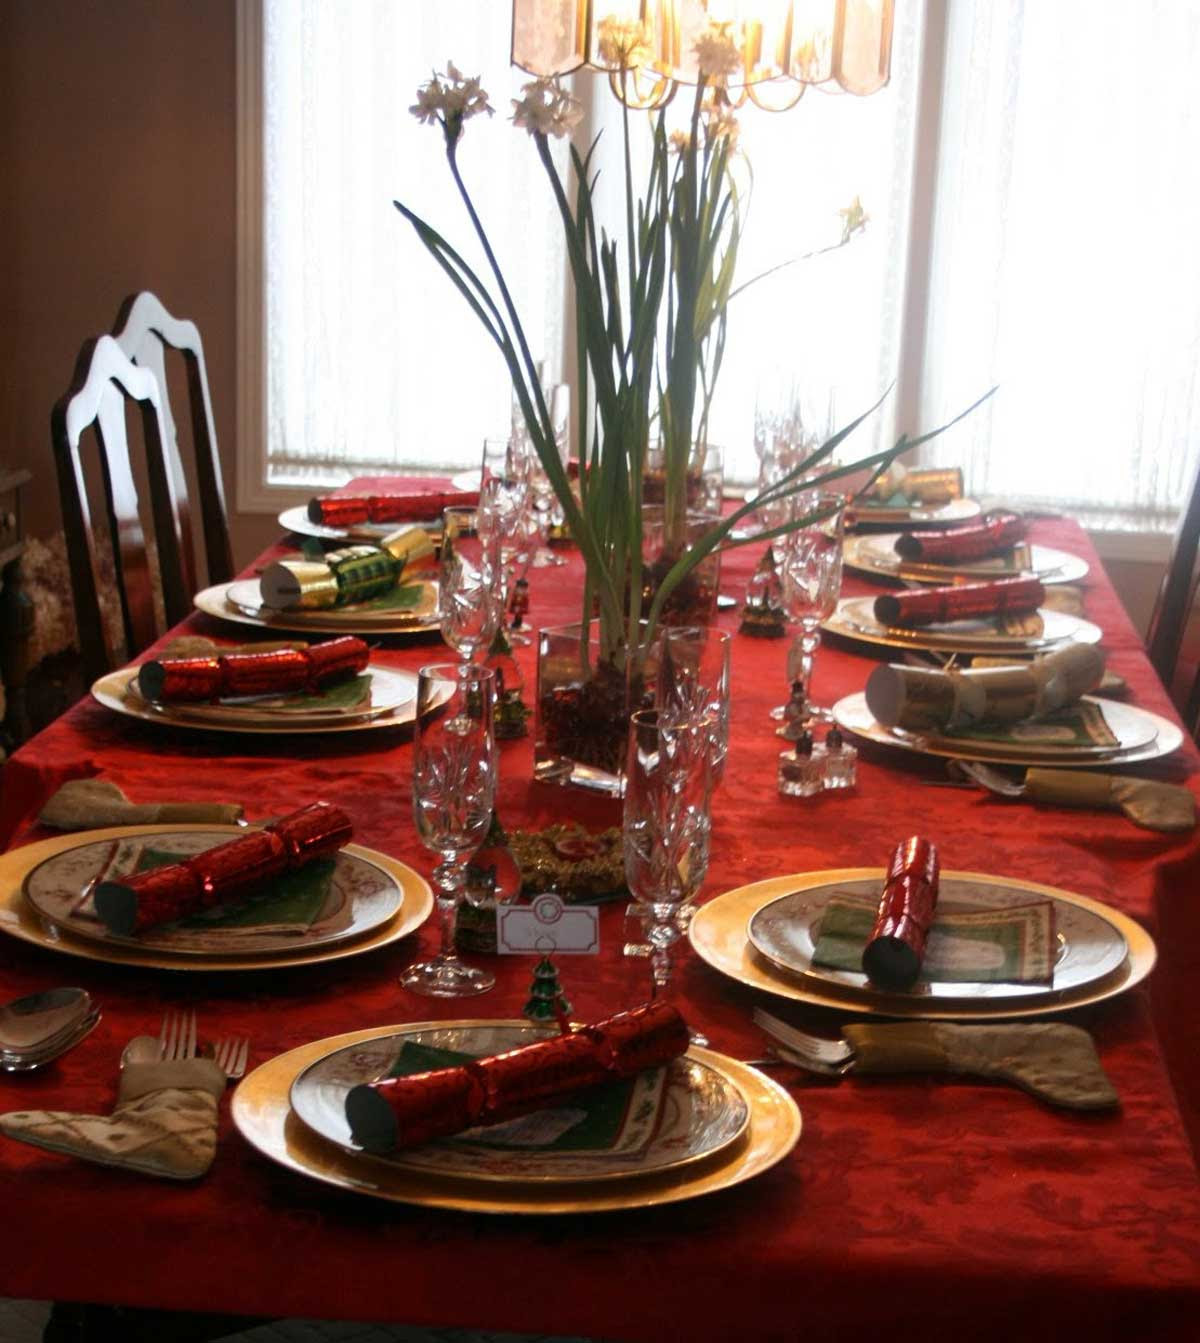 Decorating Your Dining Table | CozyHouze.com